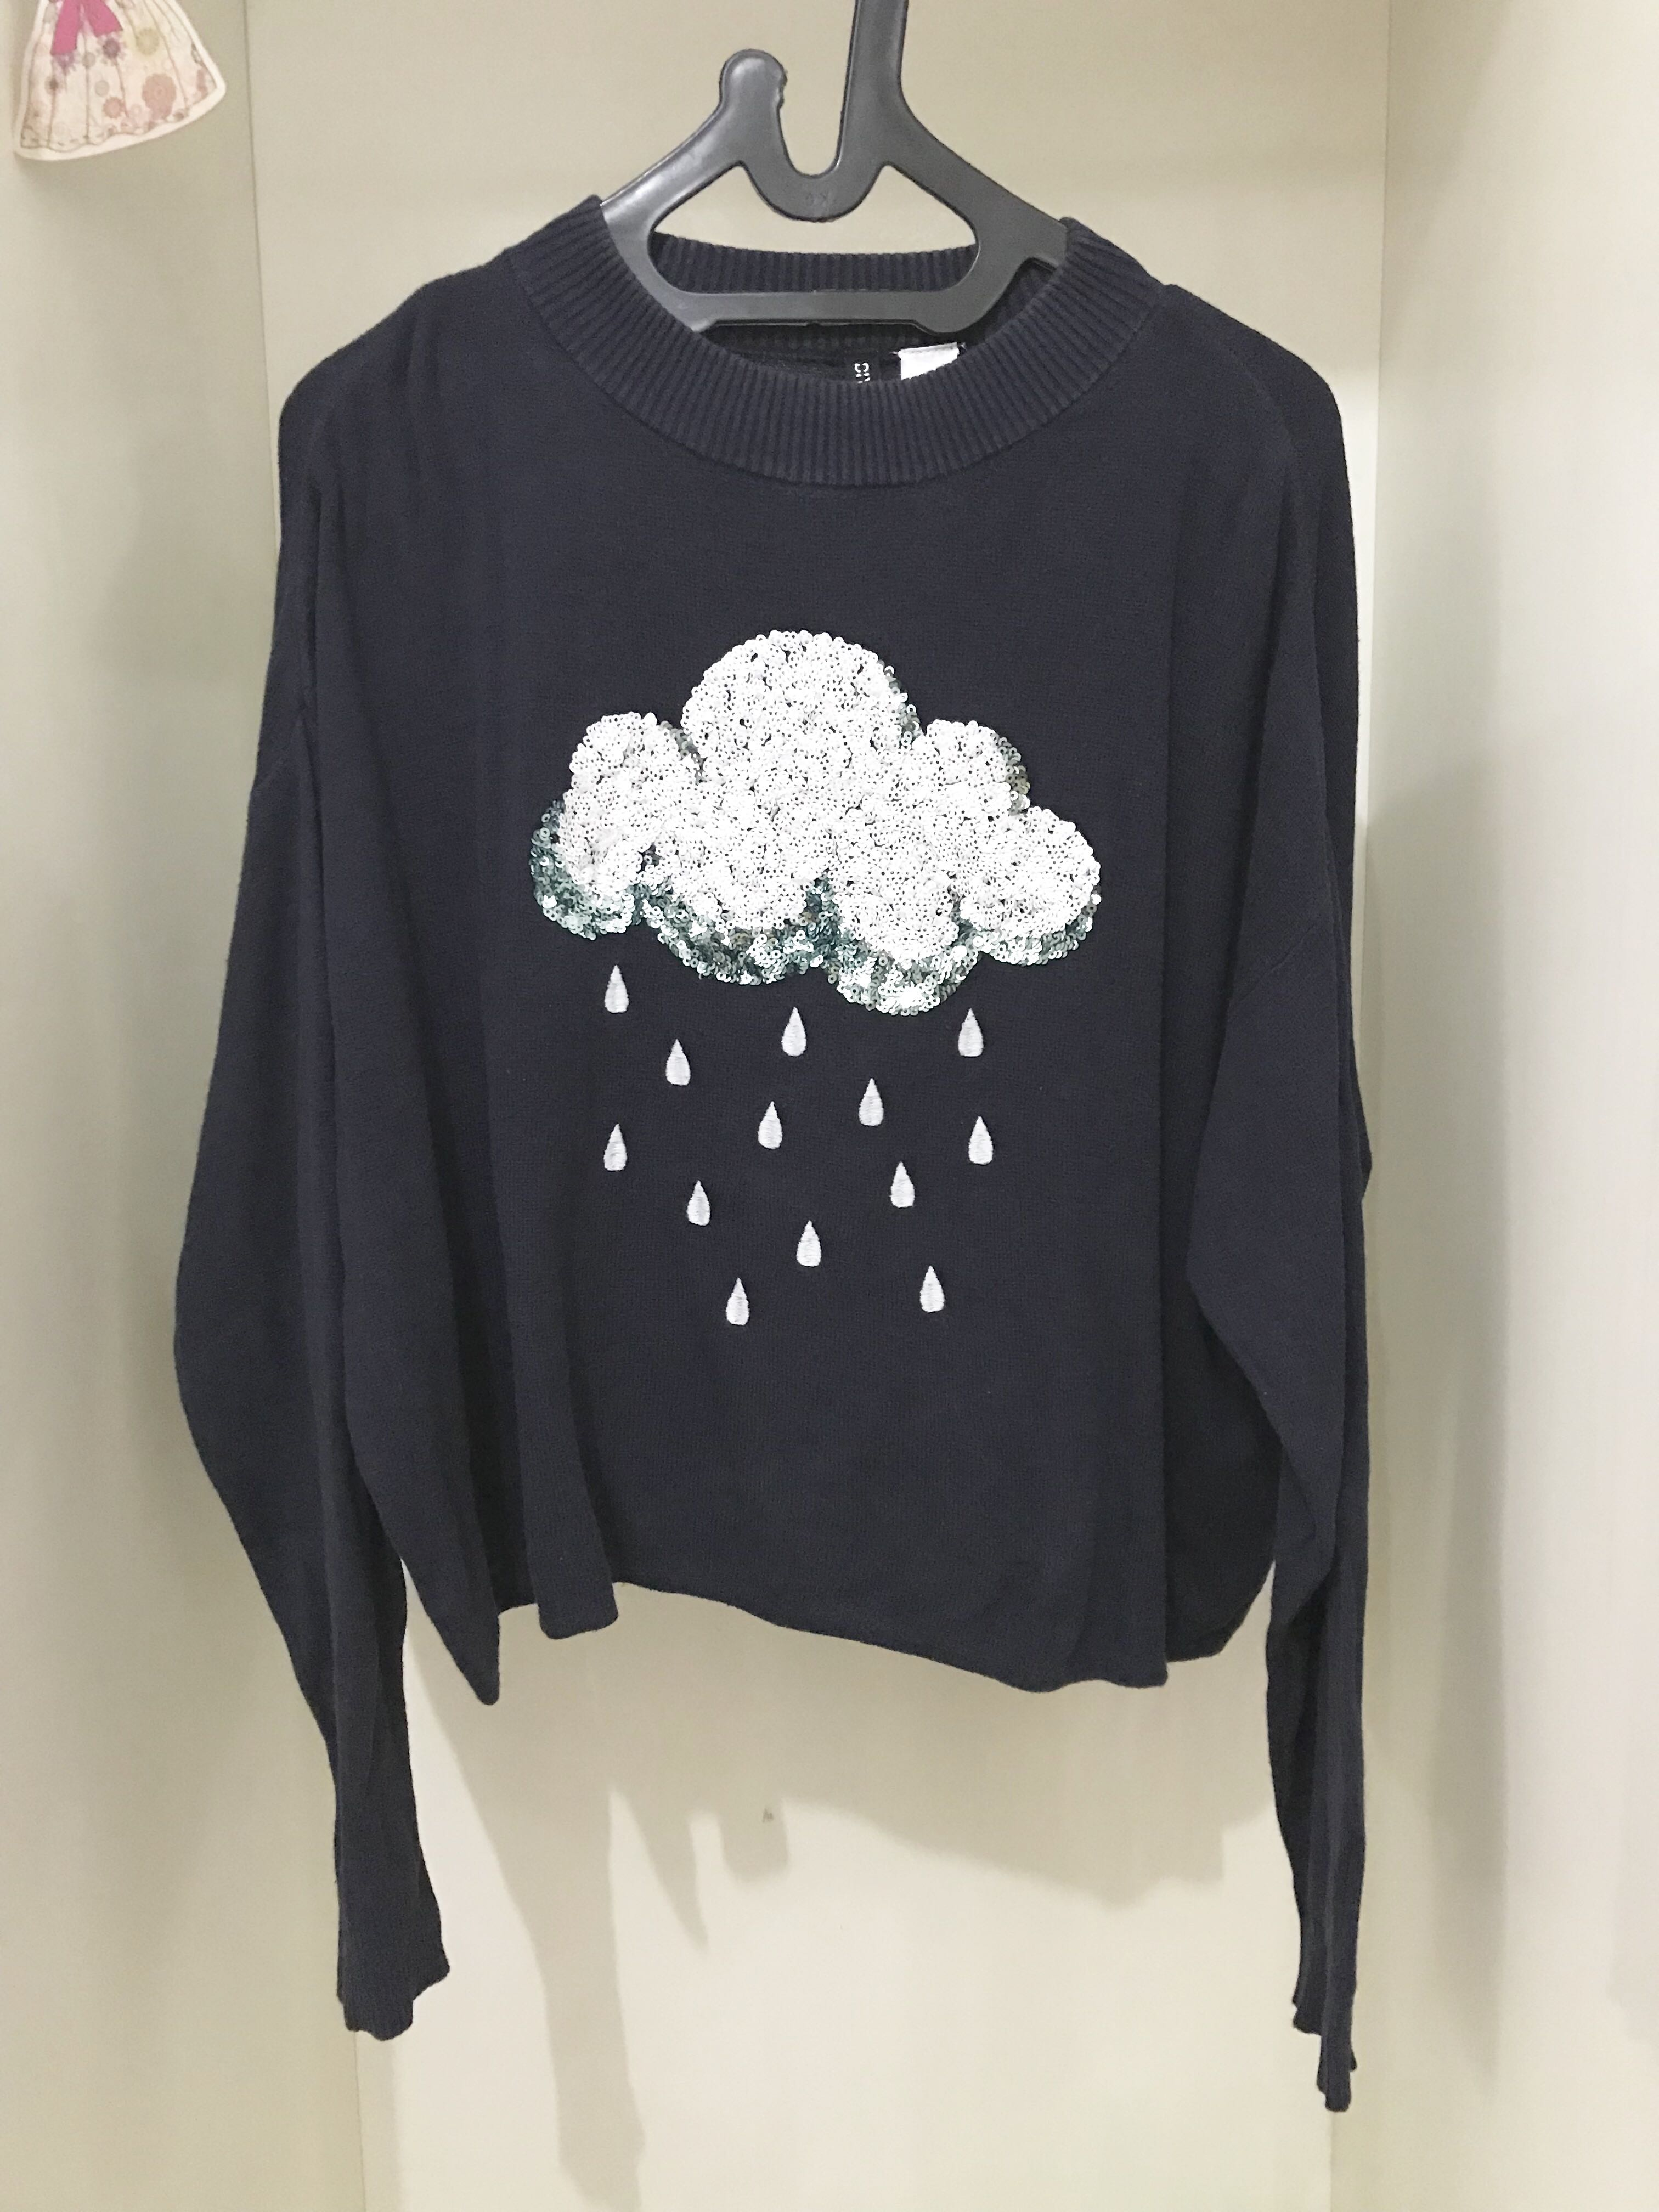 H&M Rain Sweater